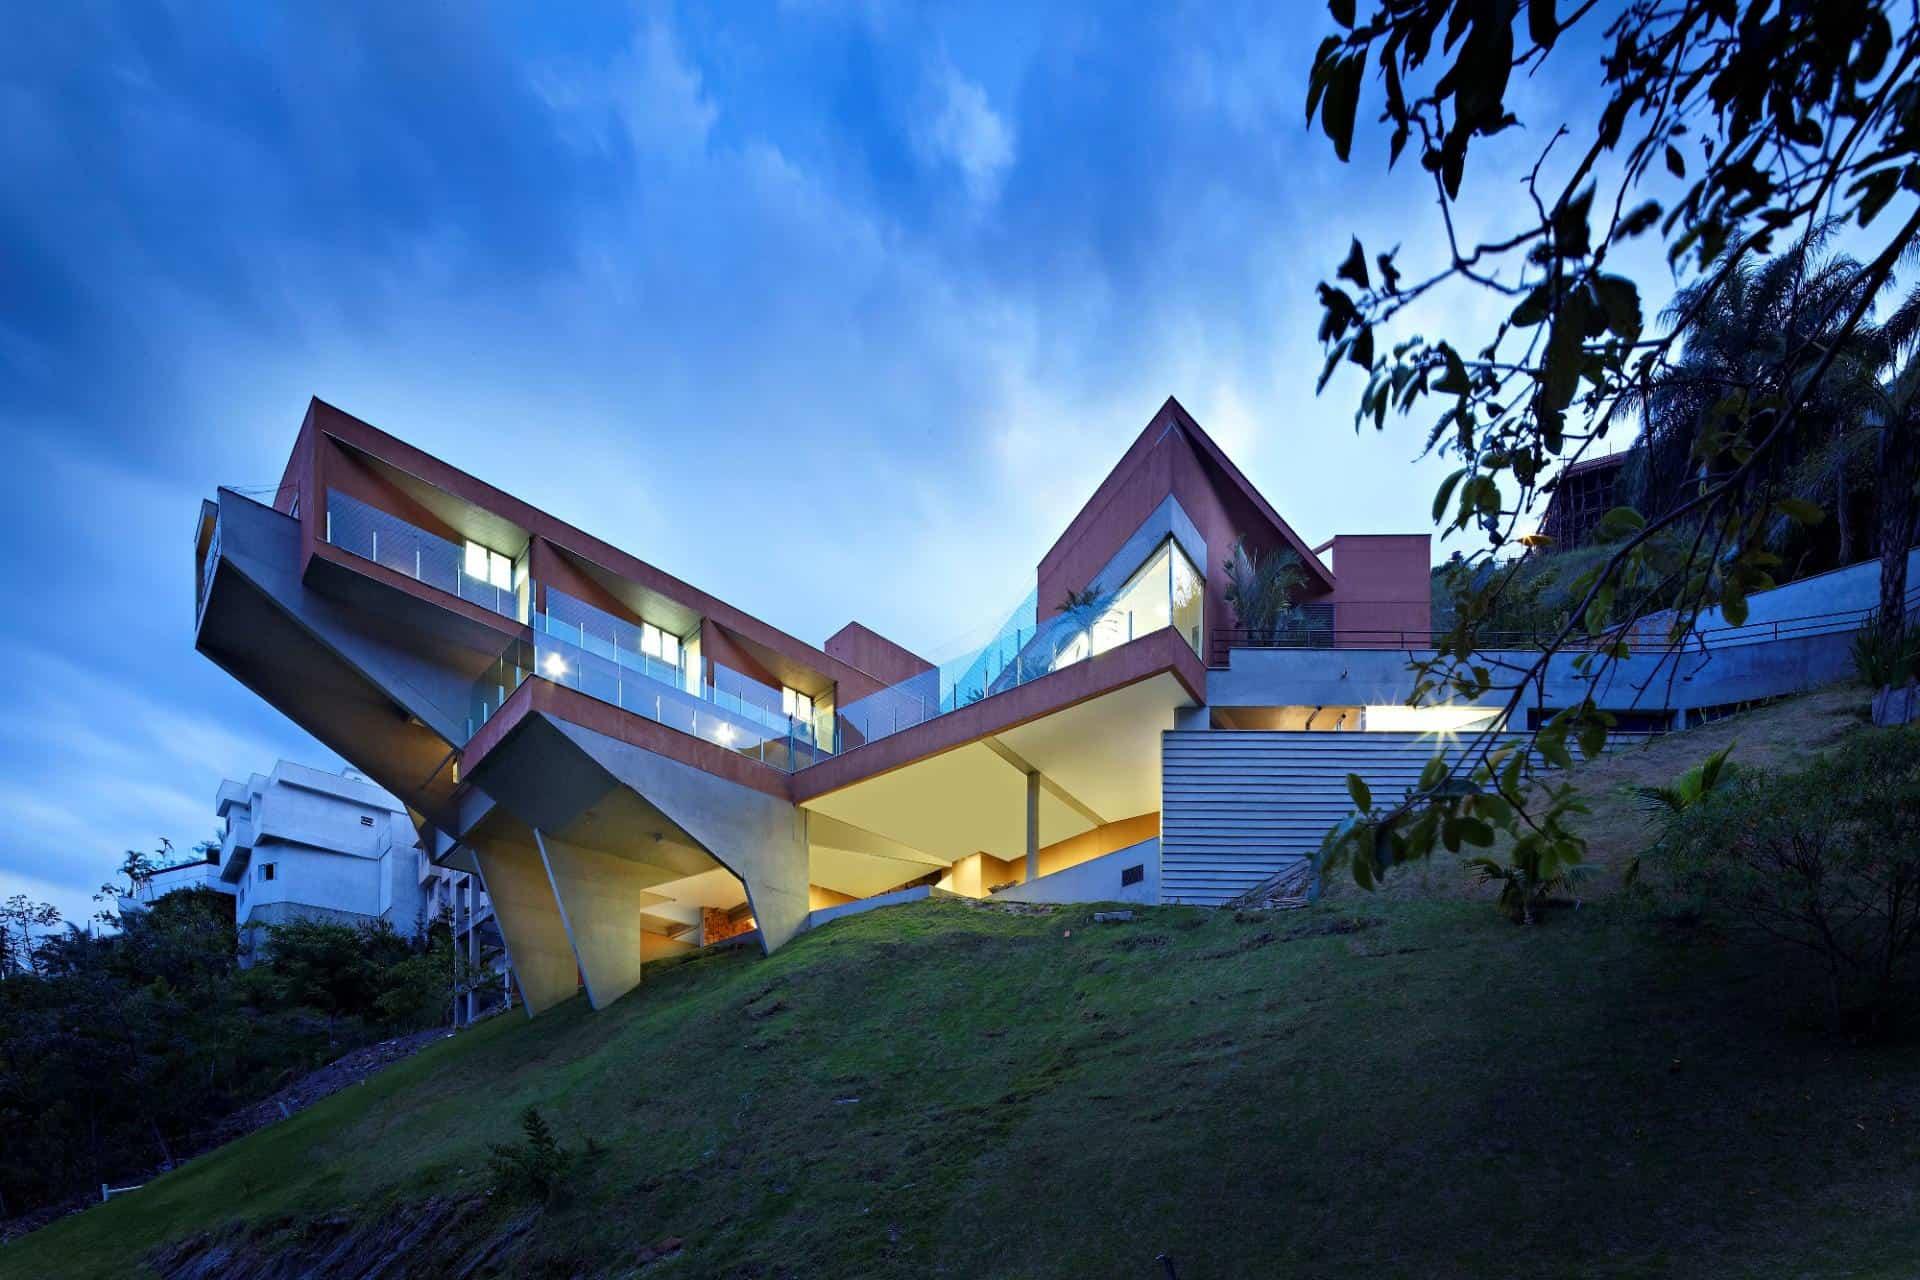 Sculptural concrete house built on a steep slope